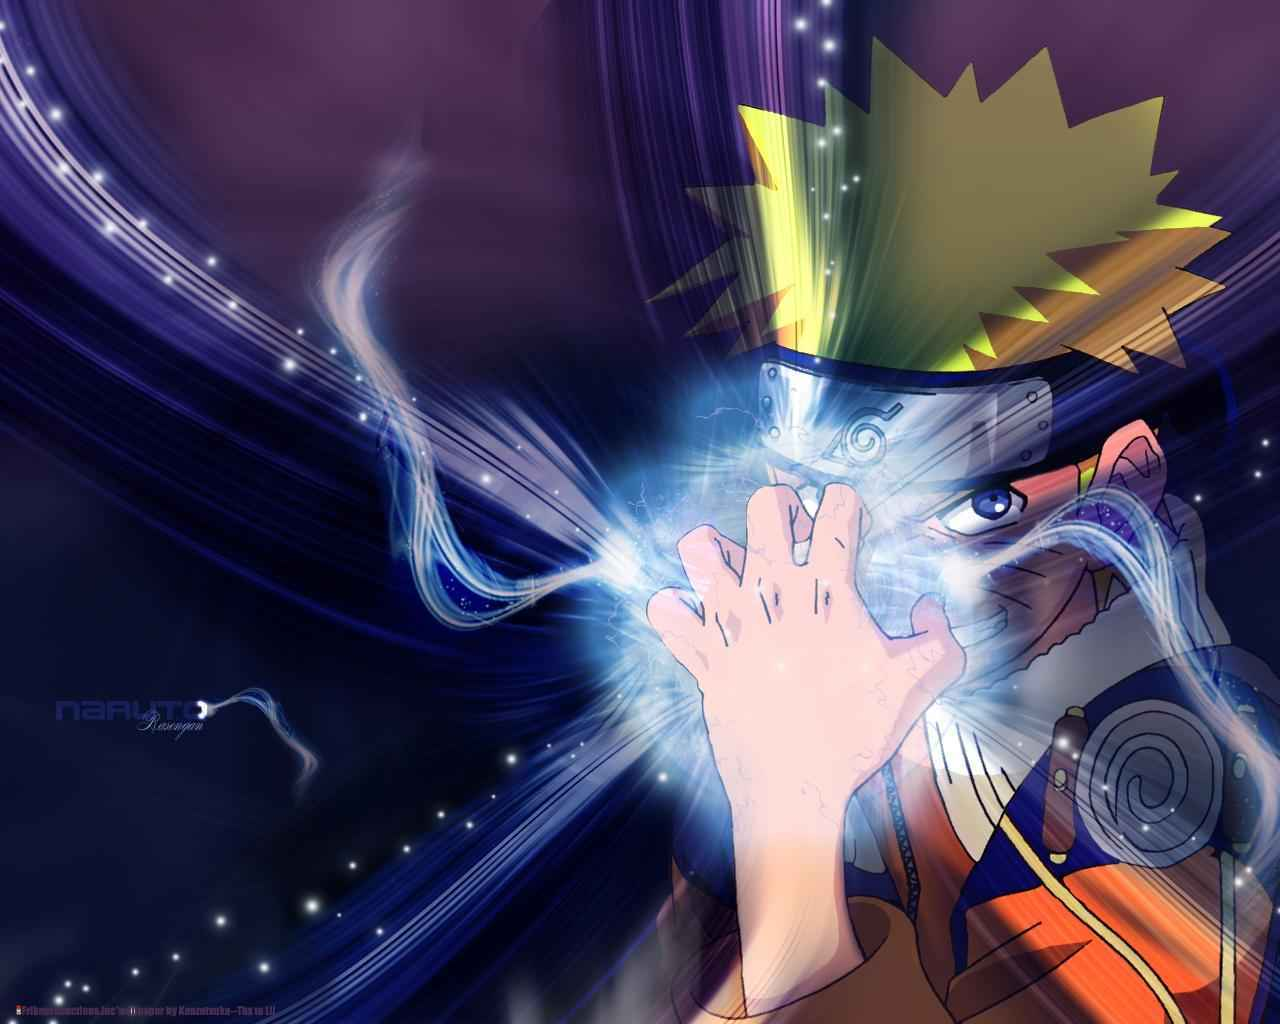 Wallpapers Naruto y Gaara 1280x1024